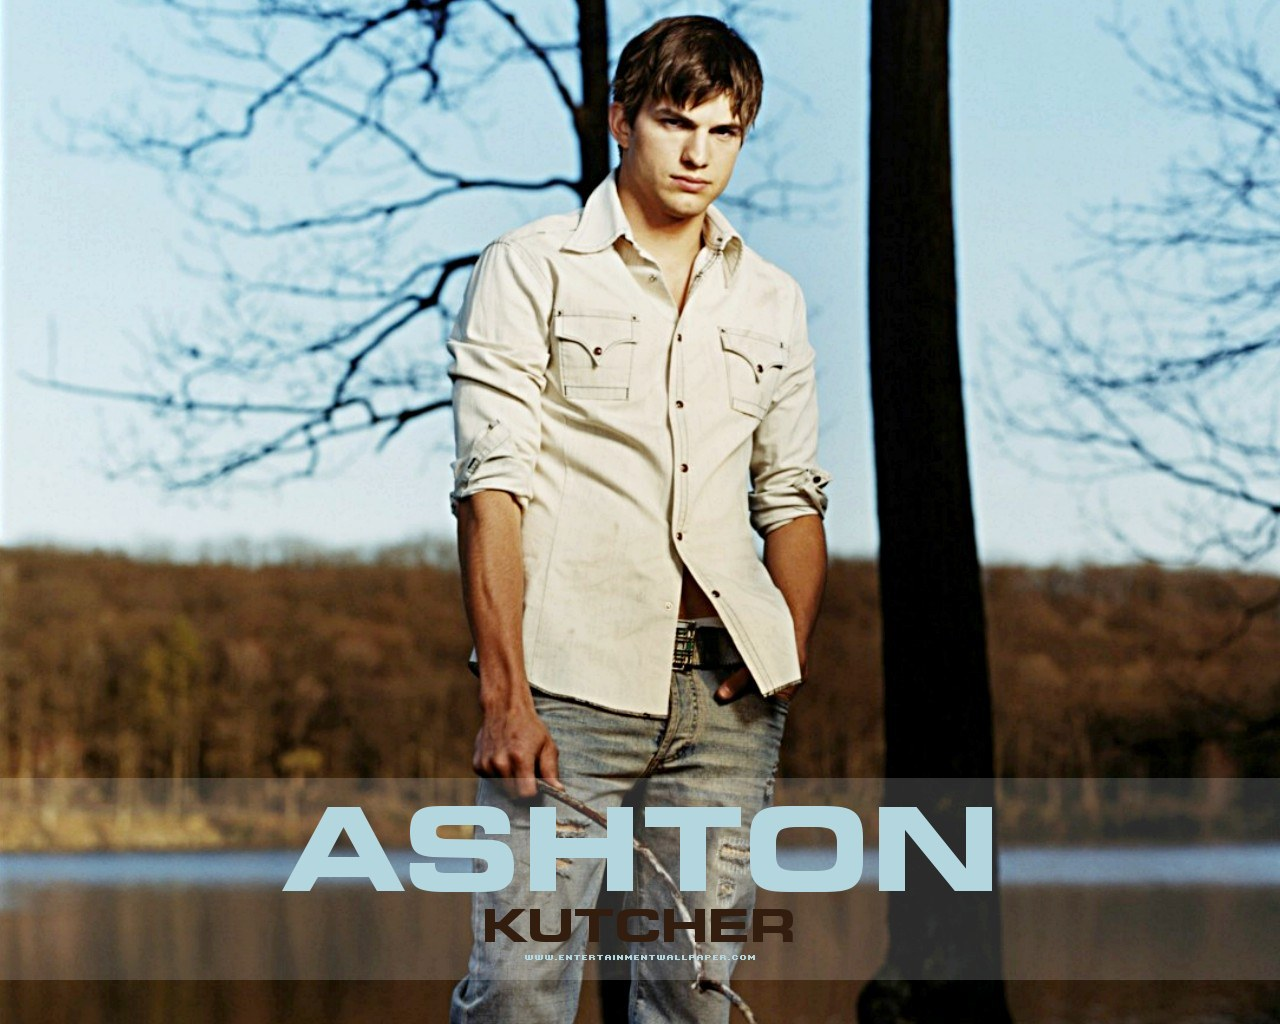 Ashton Kutch HD Wallpaper Background Images 1280x1024